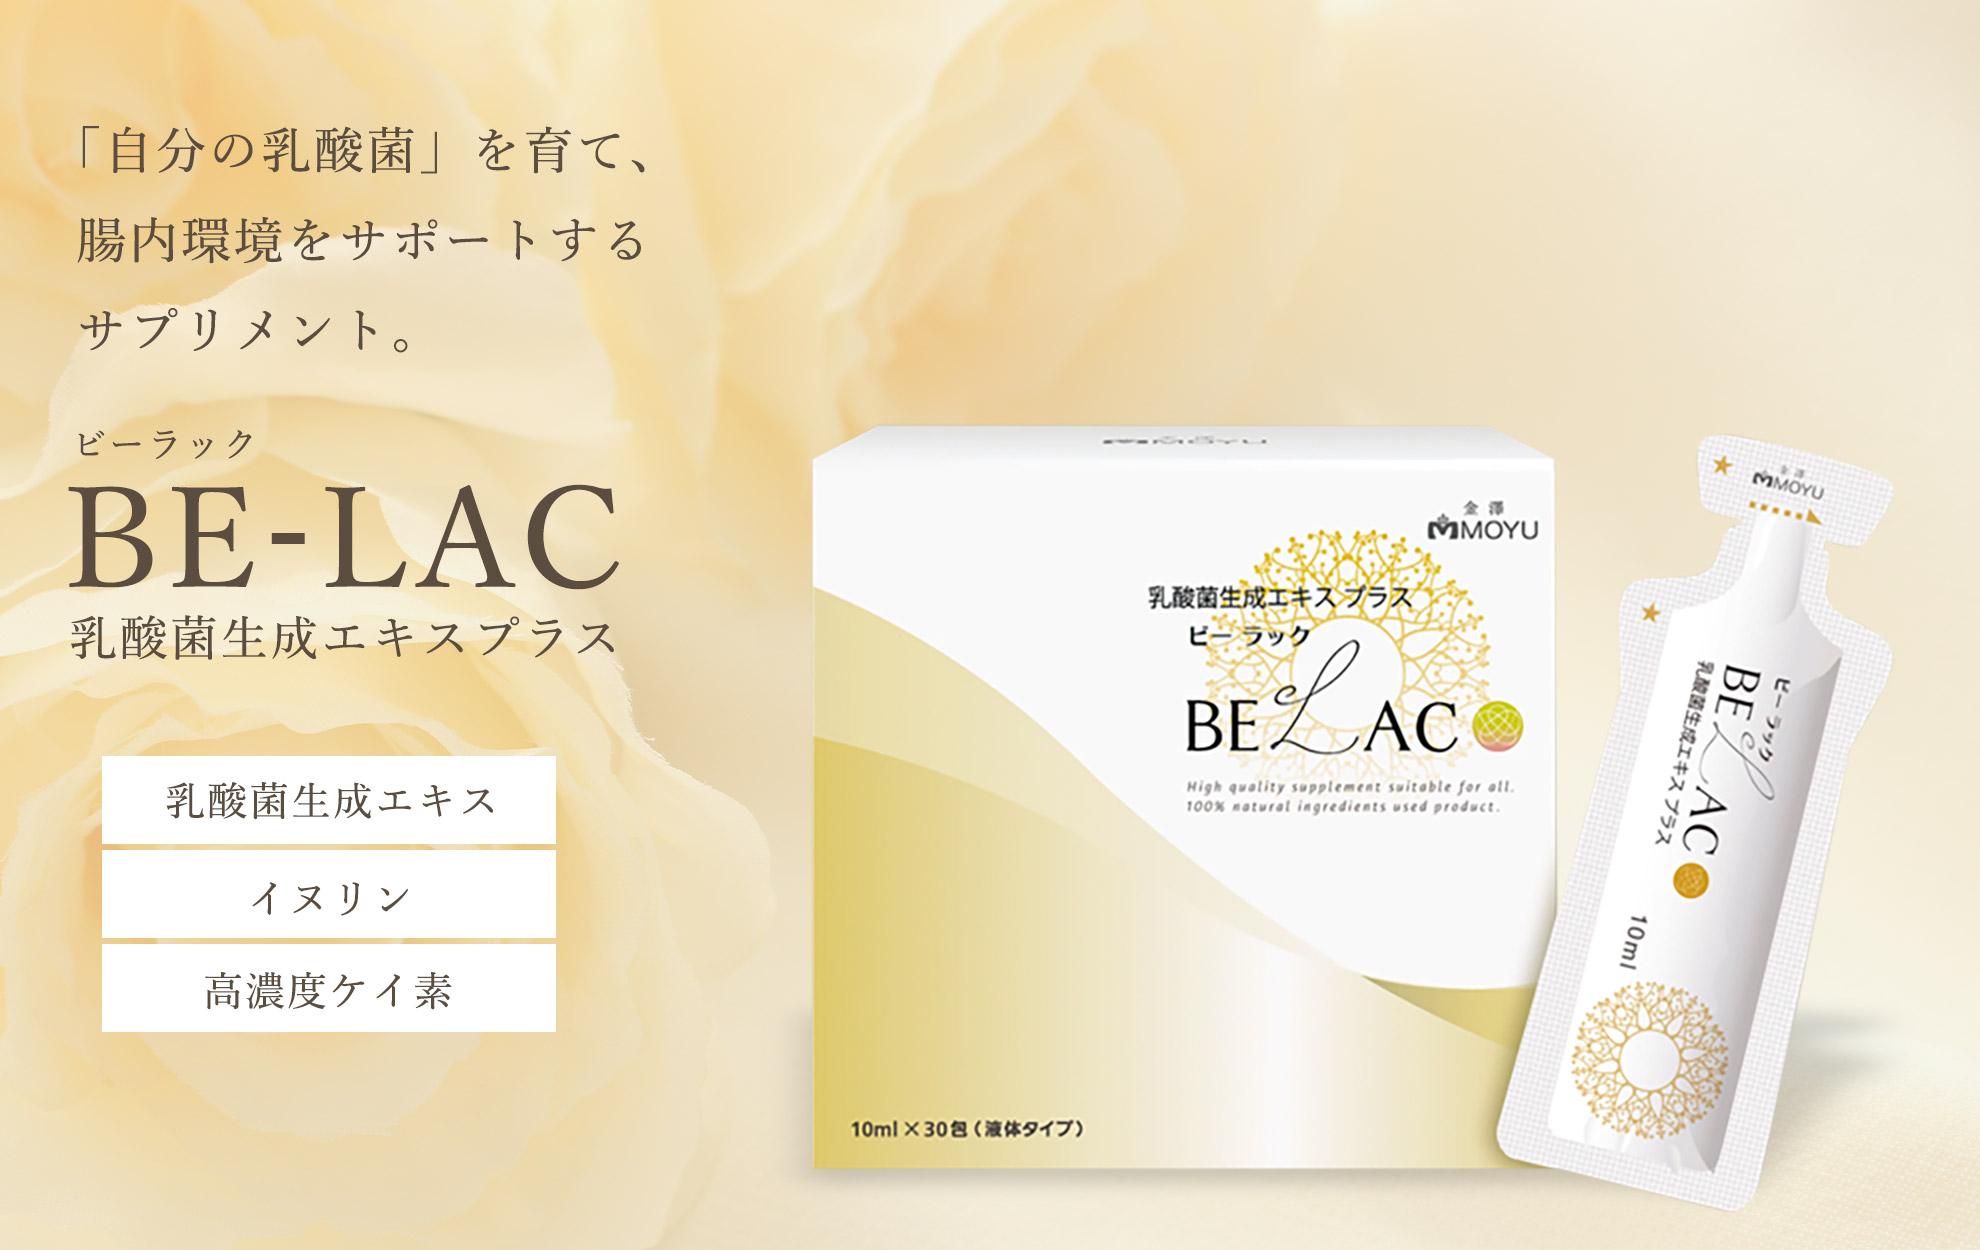 BE-LAC(乳酸菌生成エキスプラス)自分の乳酸菌を育て、腸内環境をサポートするサプリメント。